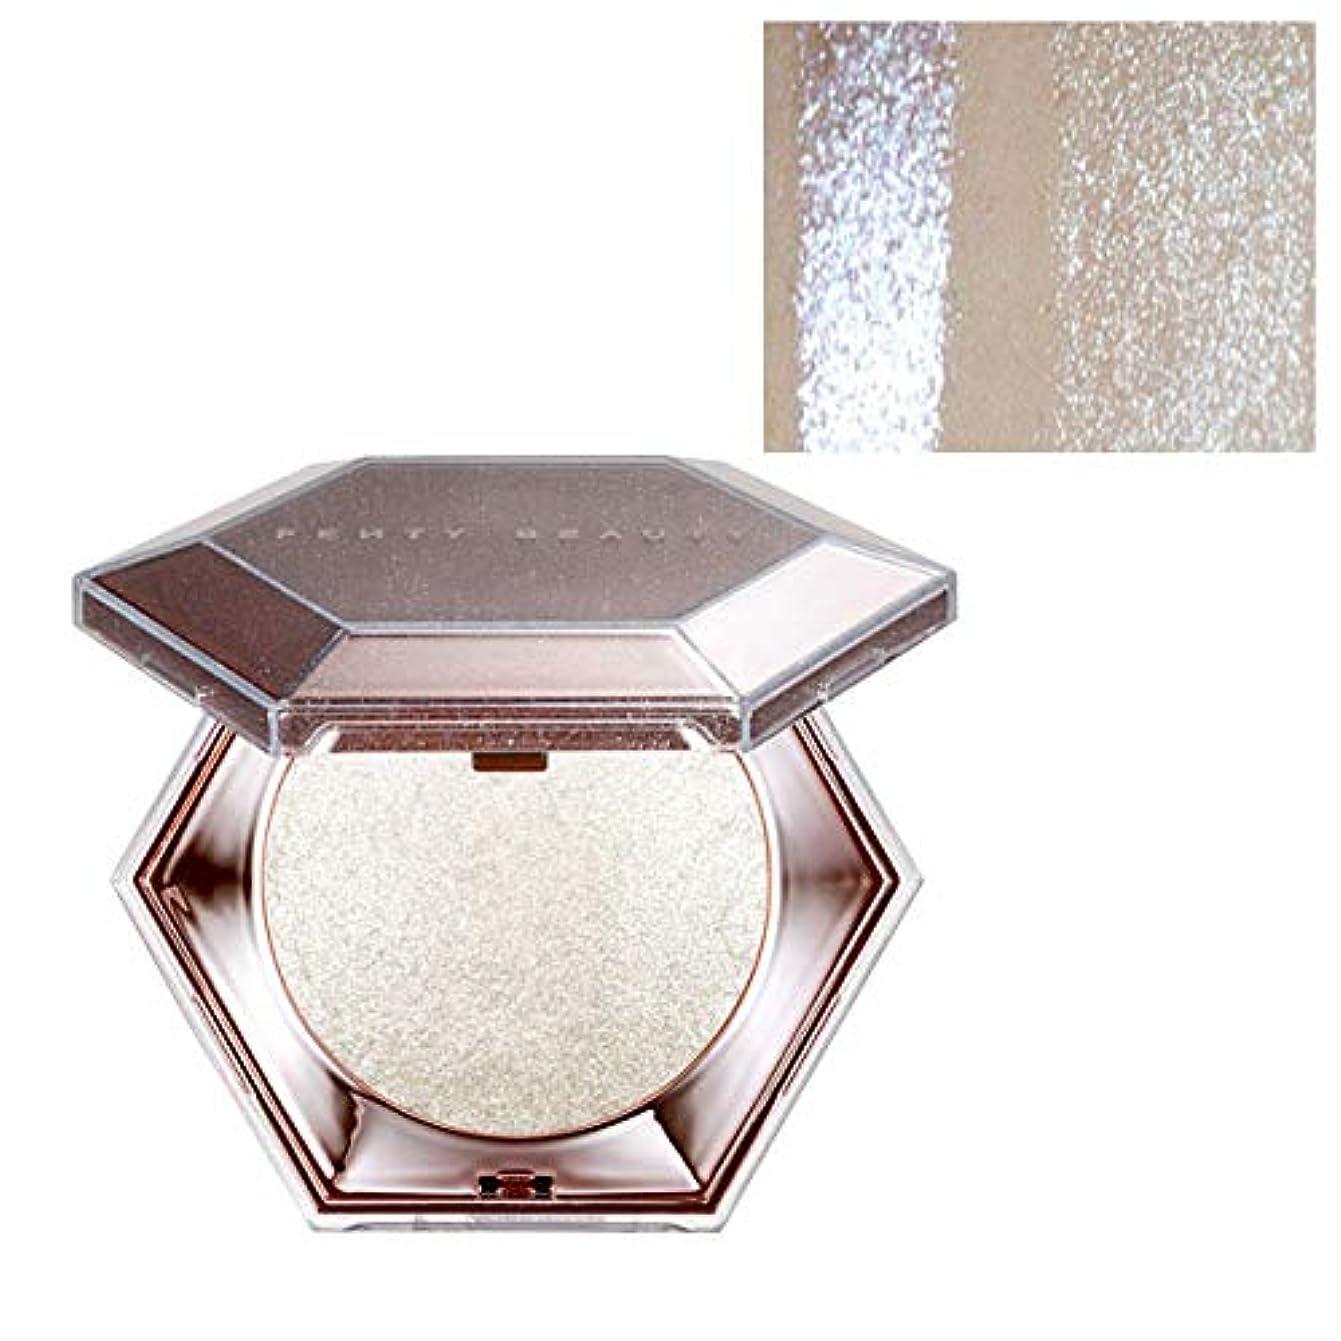 予想外獣ファンブルFENTY BEAUTY BY RIHANNA Diamond Bomb All-Over Diamond Veil [海外直送品] [並行輸入品]